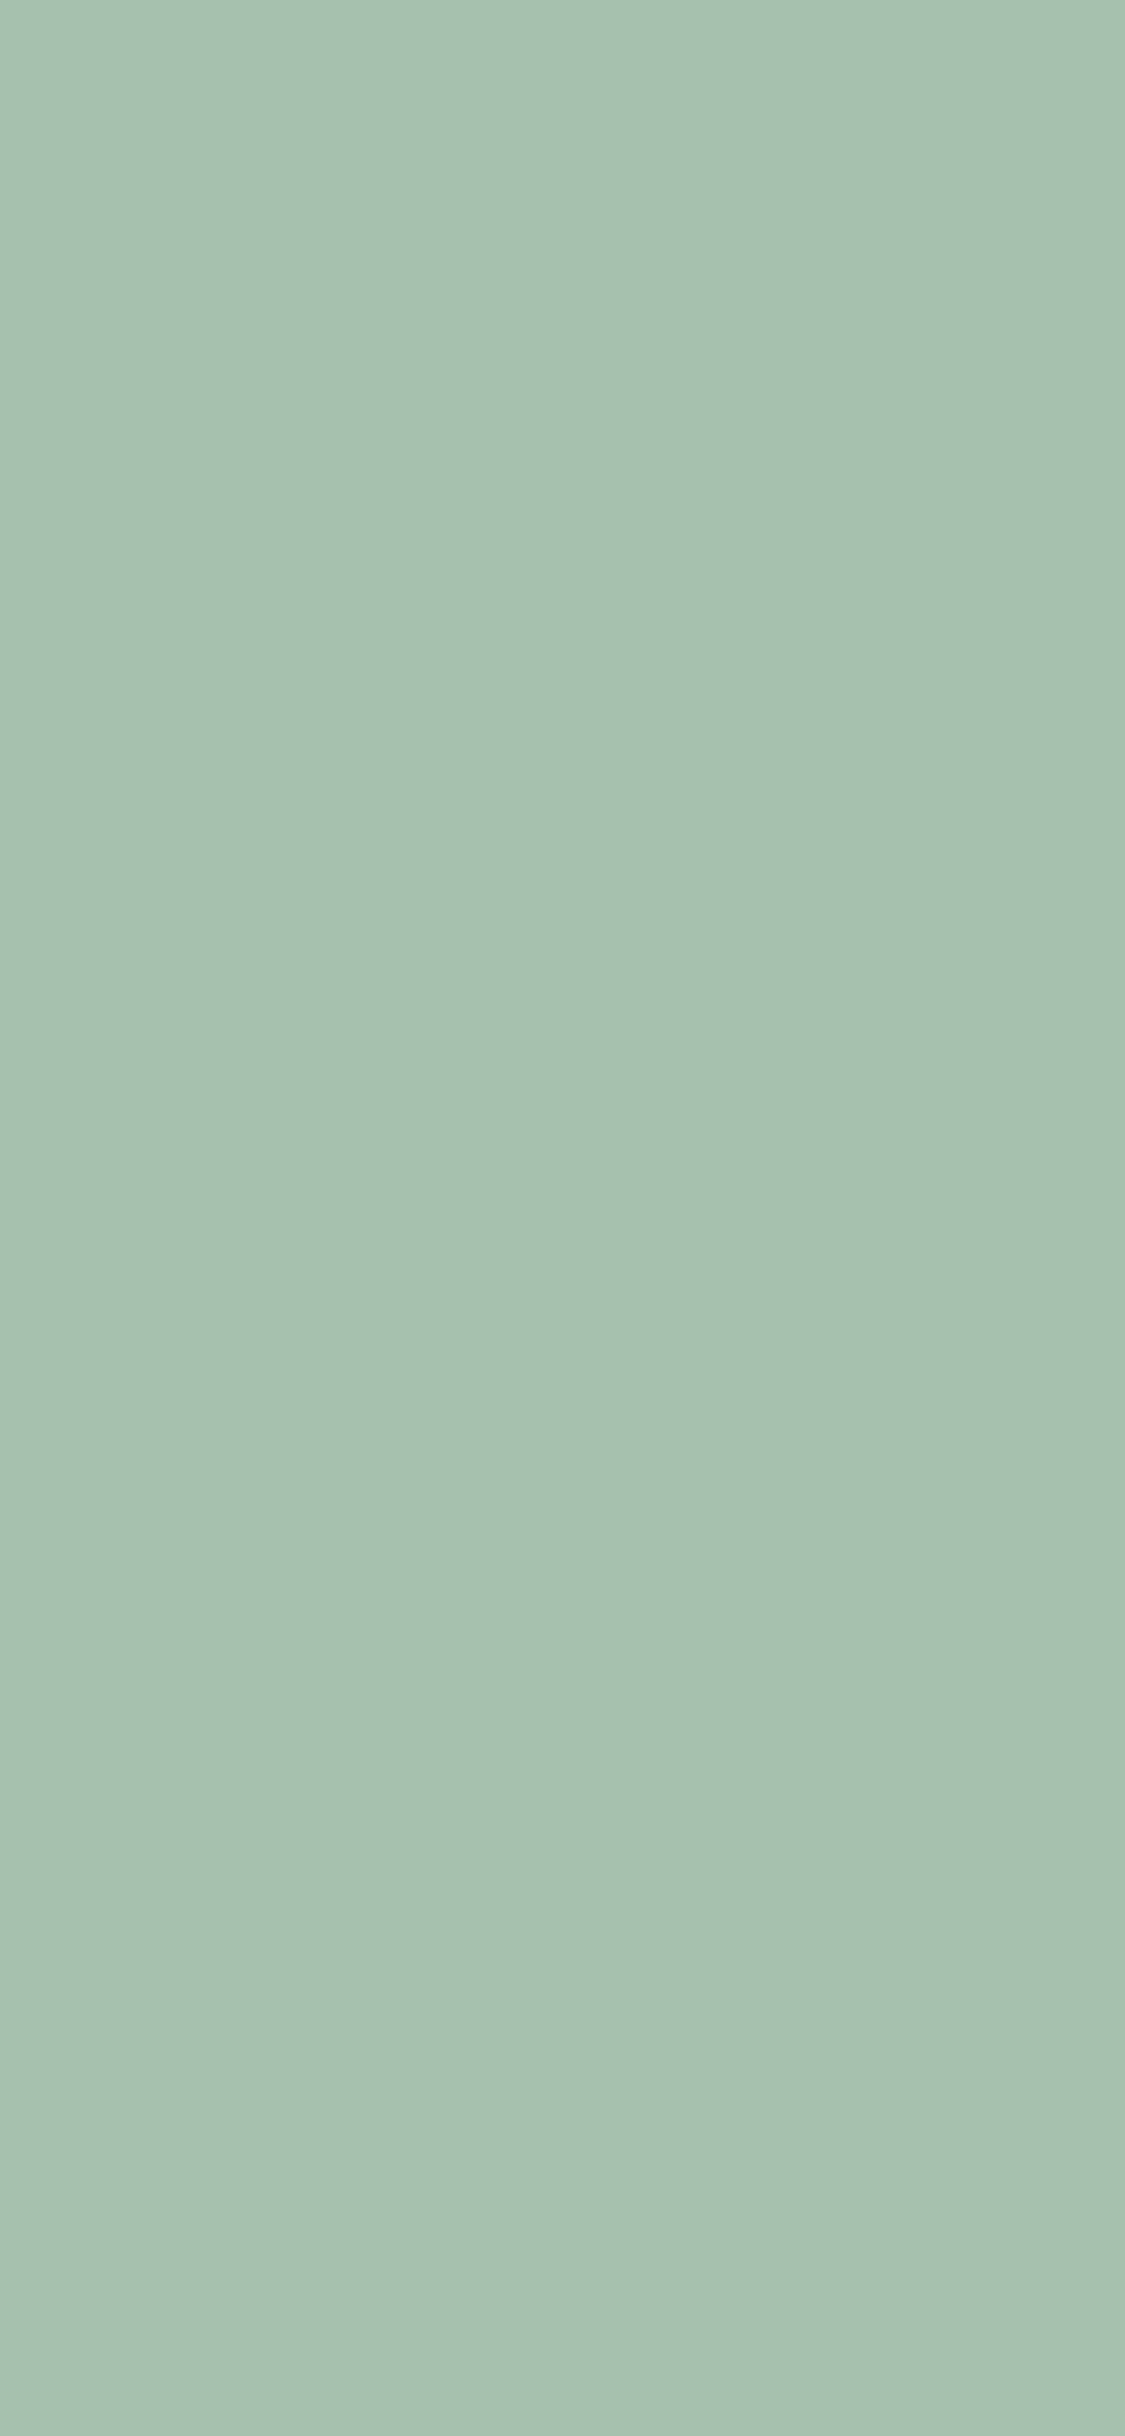 1125x2436 Cambridge Blue Solid Color Background